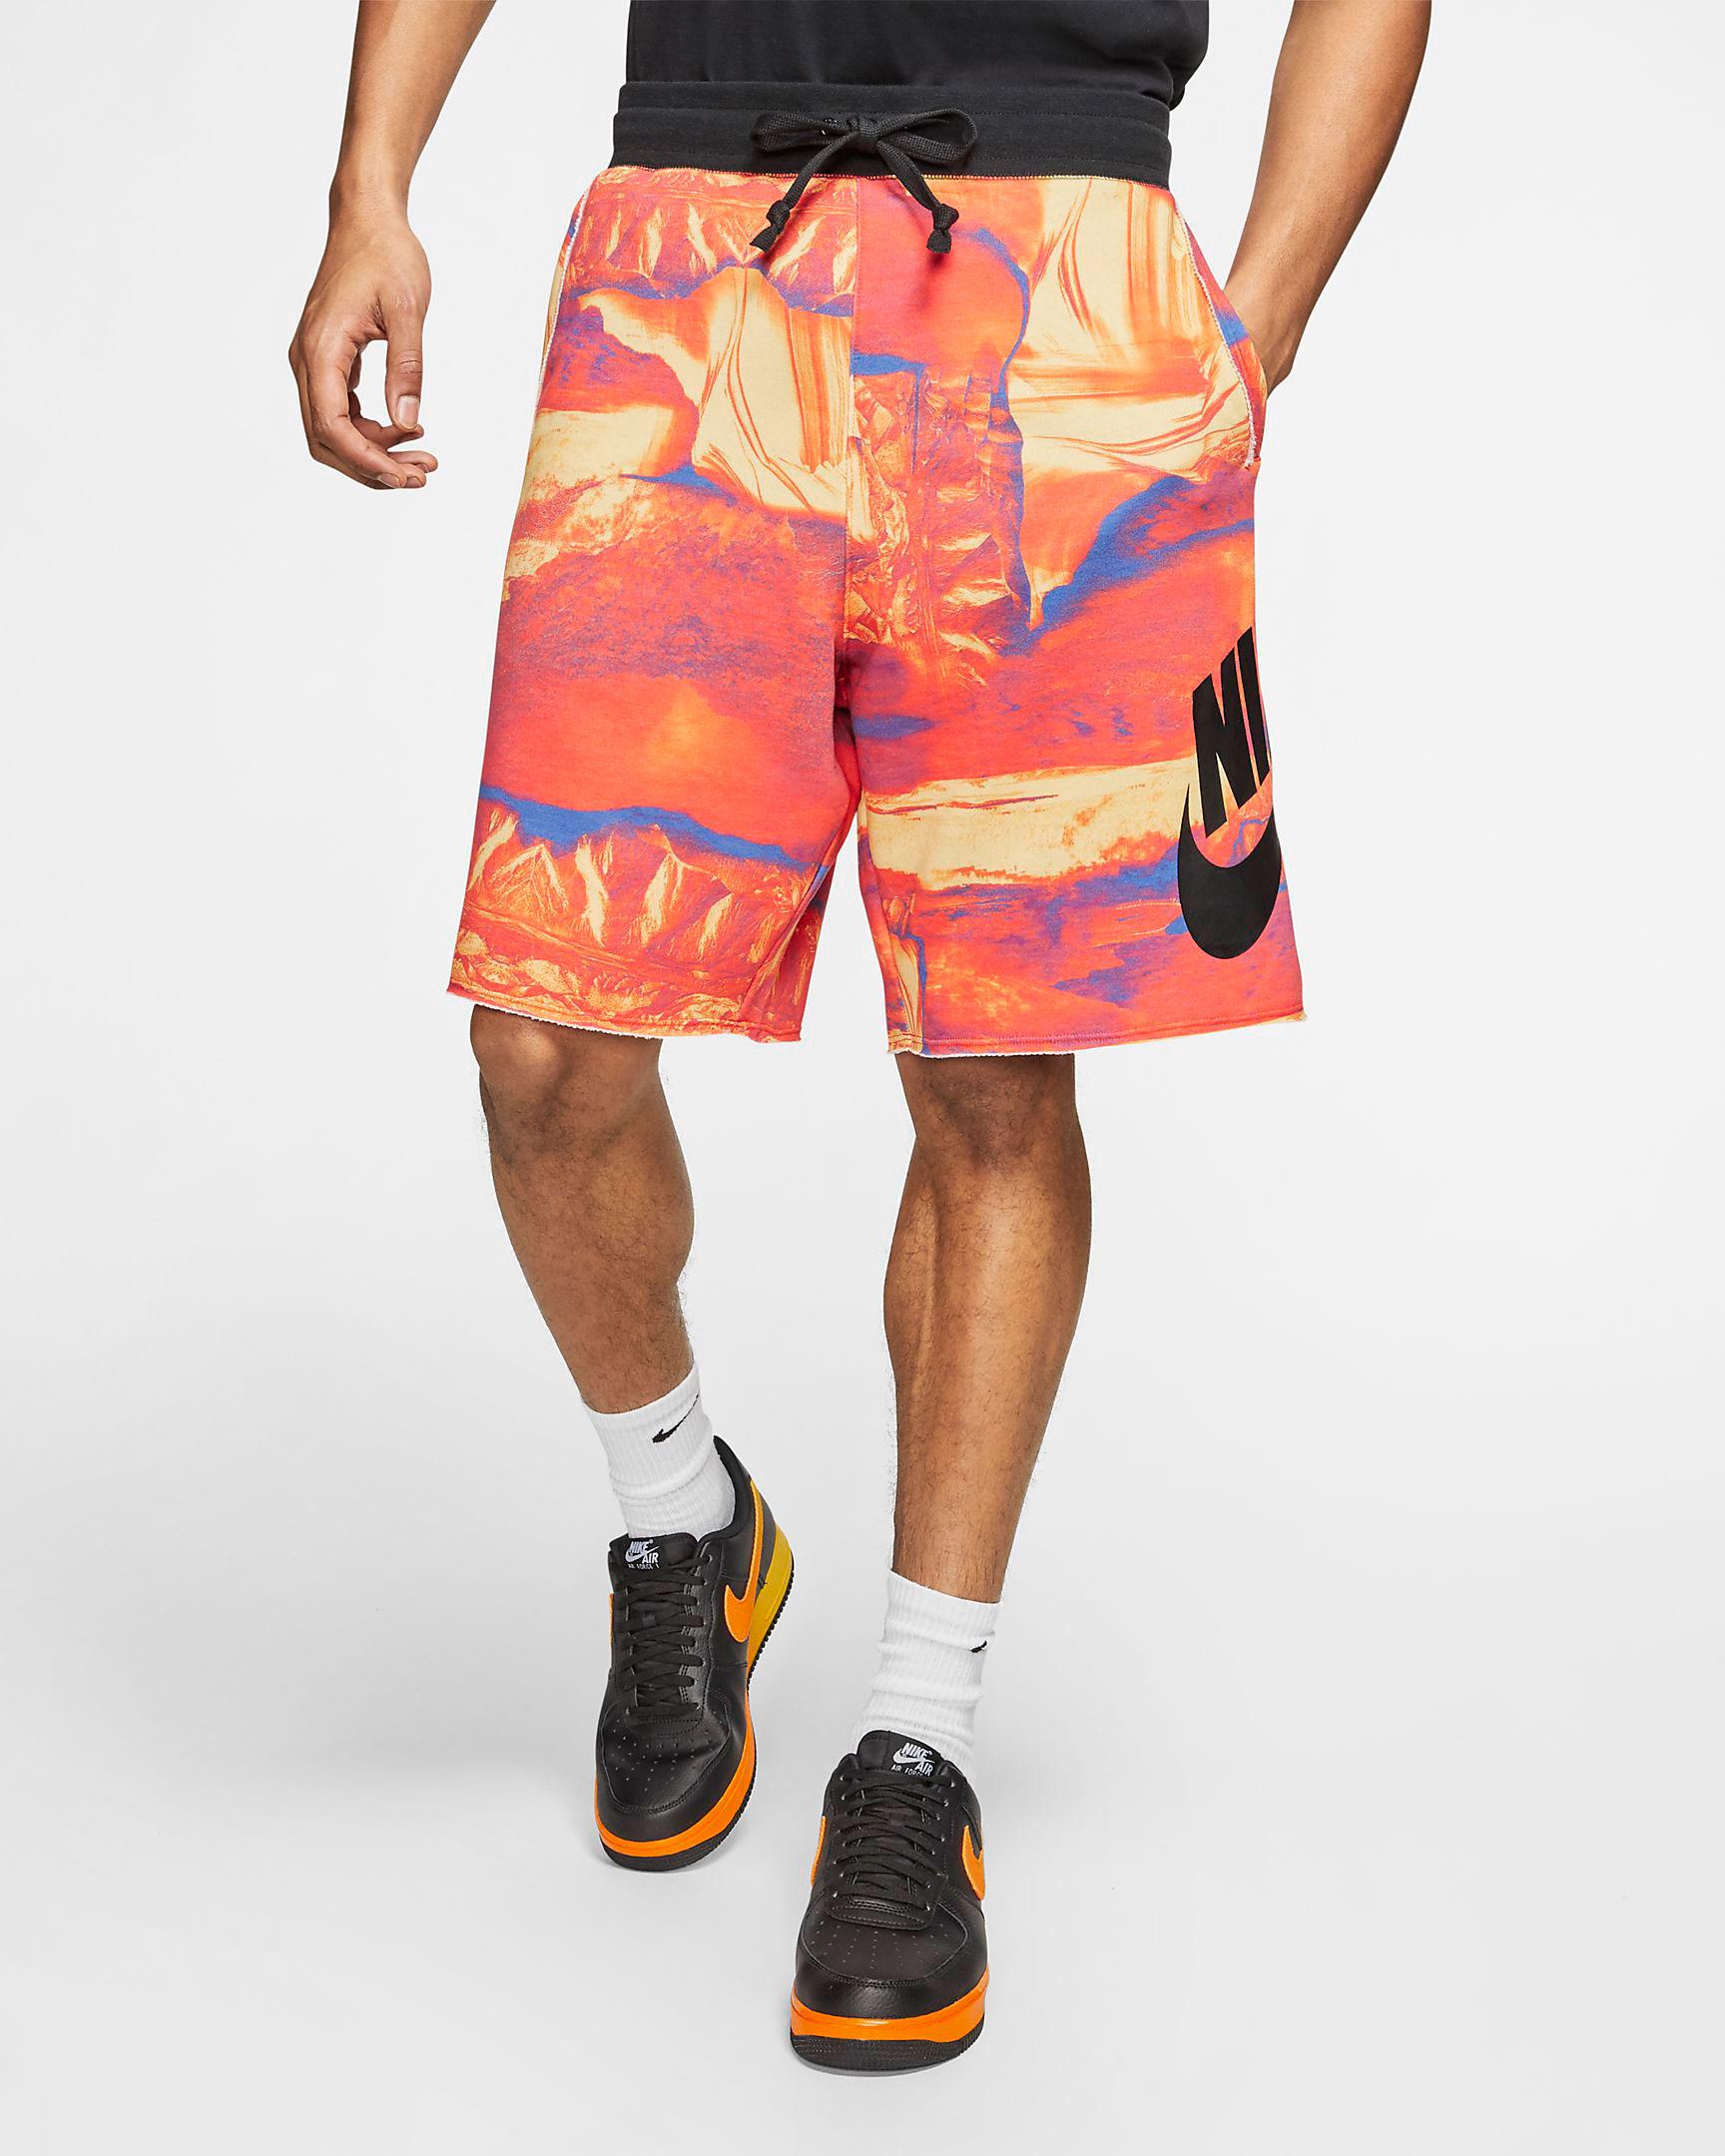 nike-organic-distortion-shorts-1